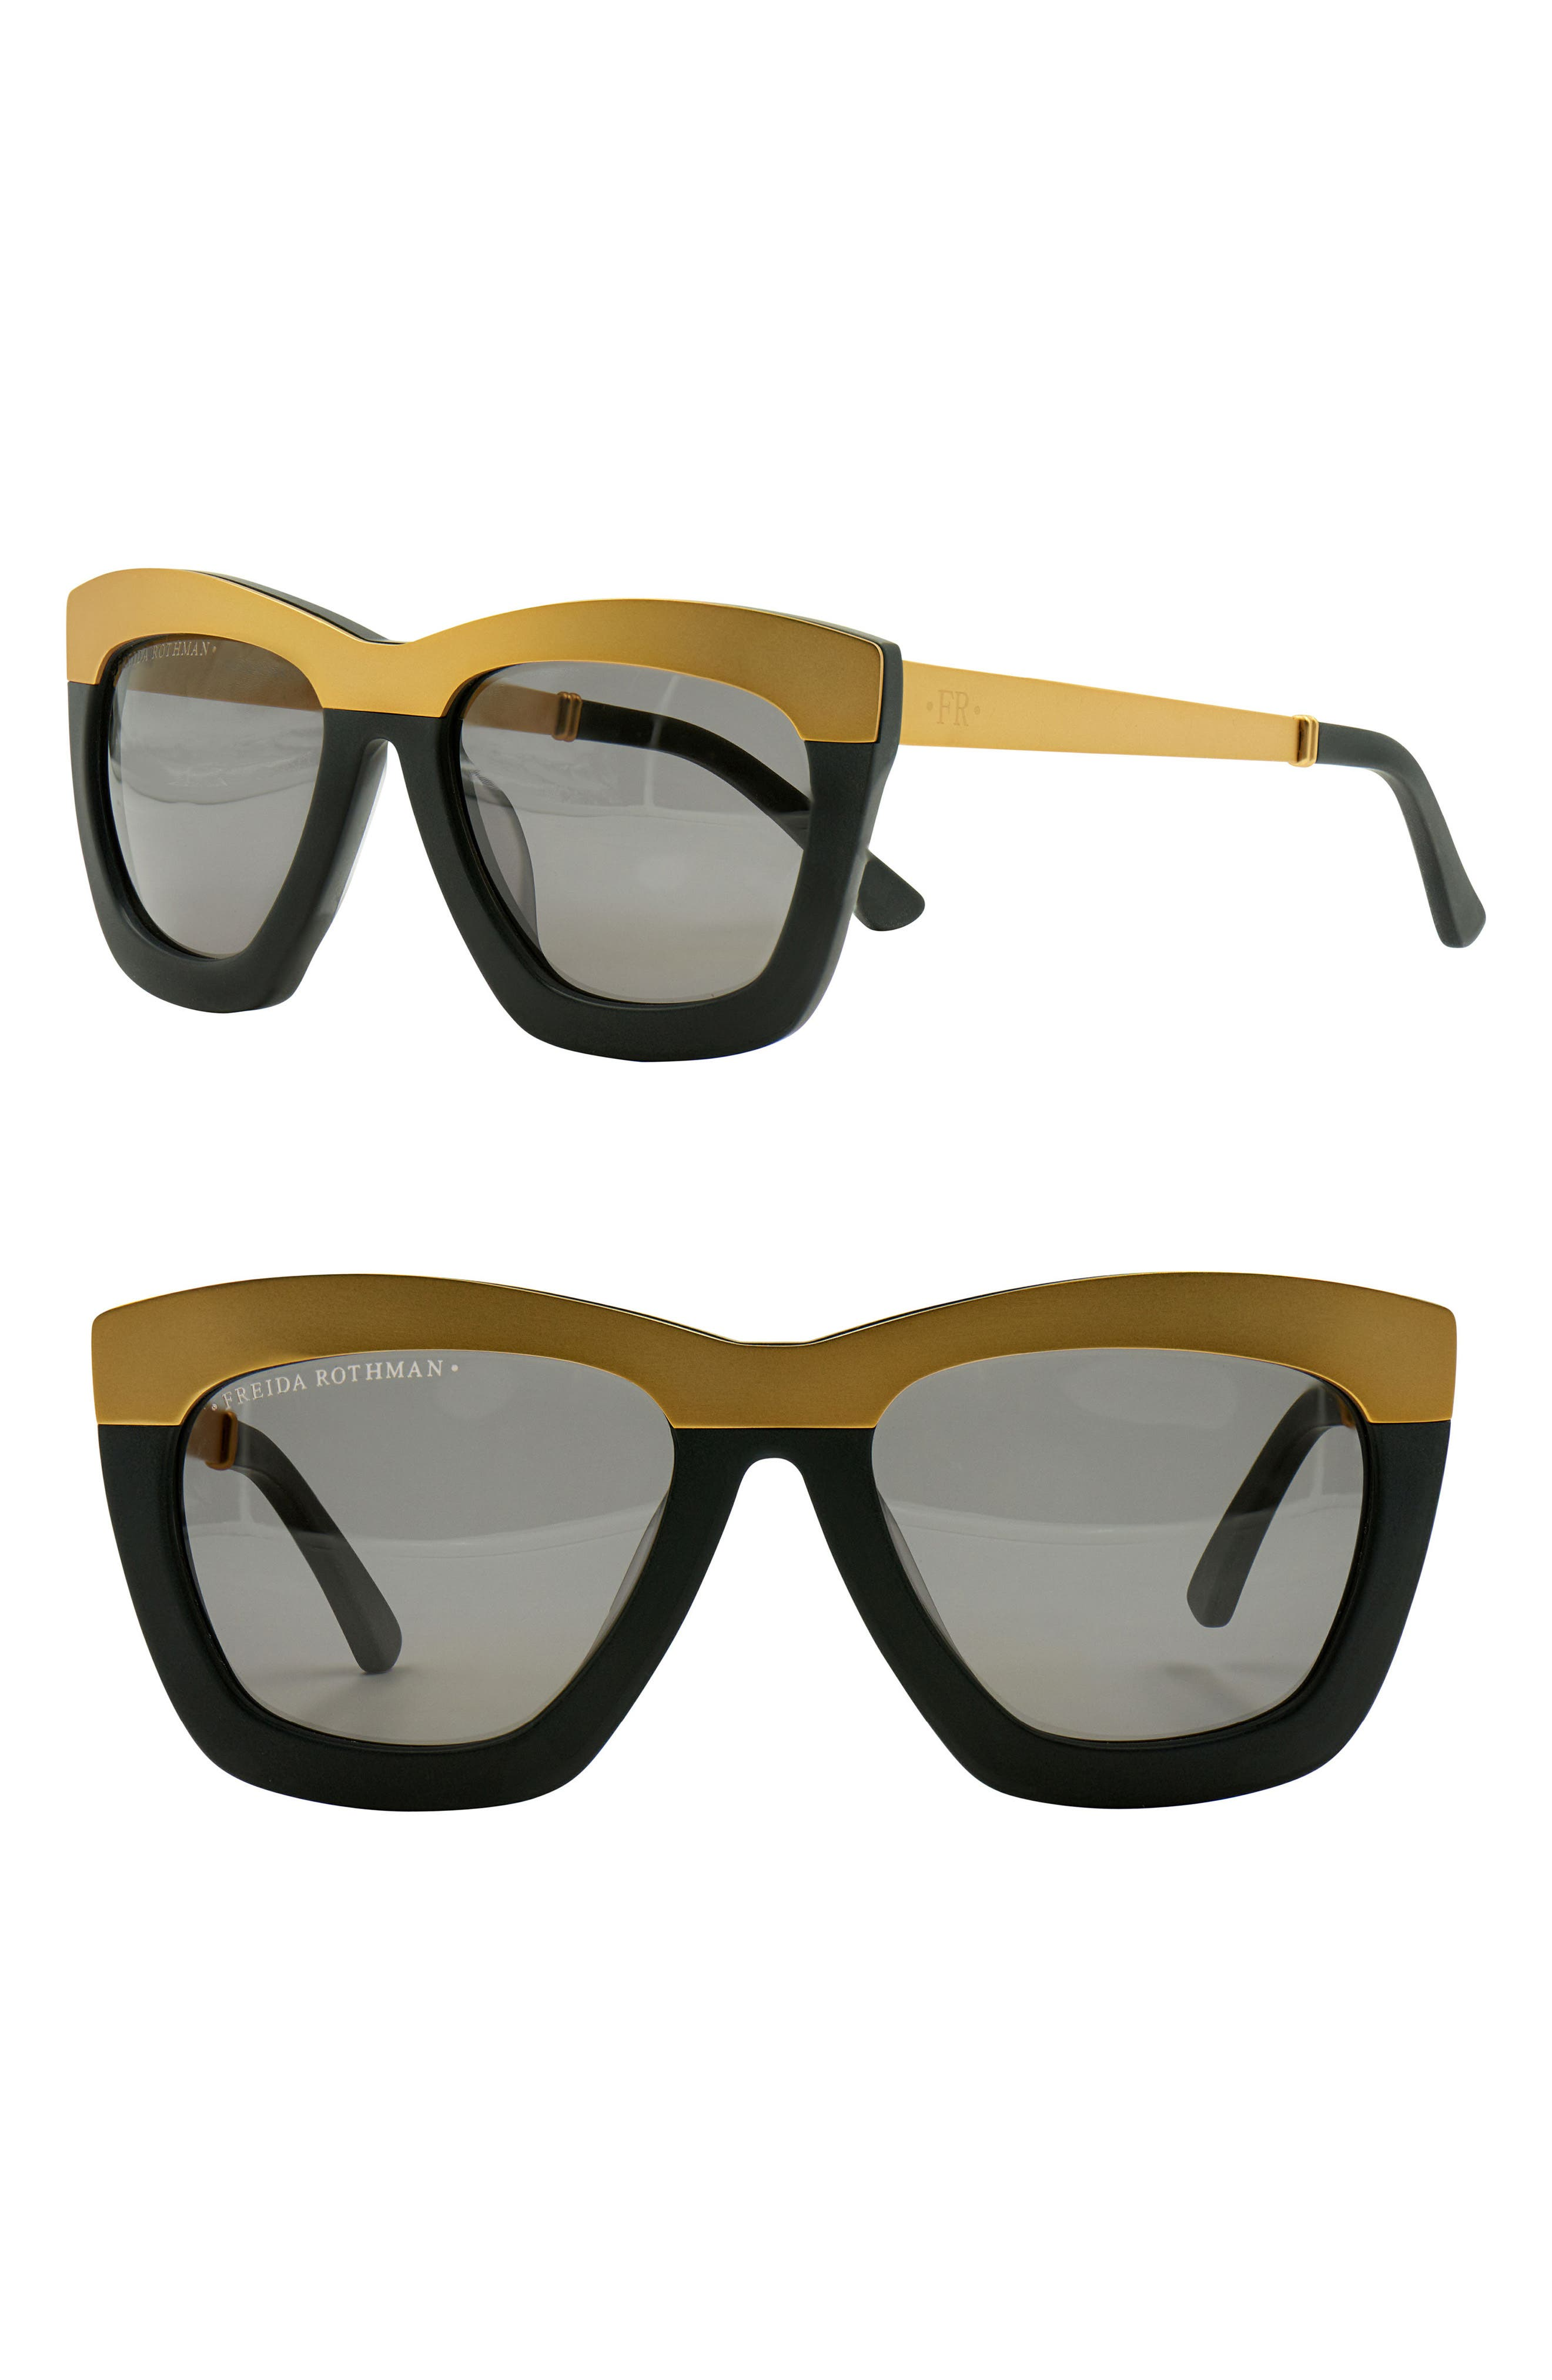 Main Image - FREIDA ROTHMAN Hadlee 53mm Square Cat Eye Sunglasses